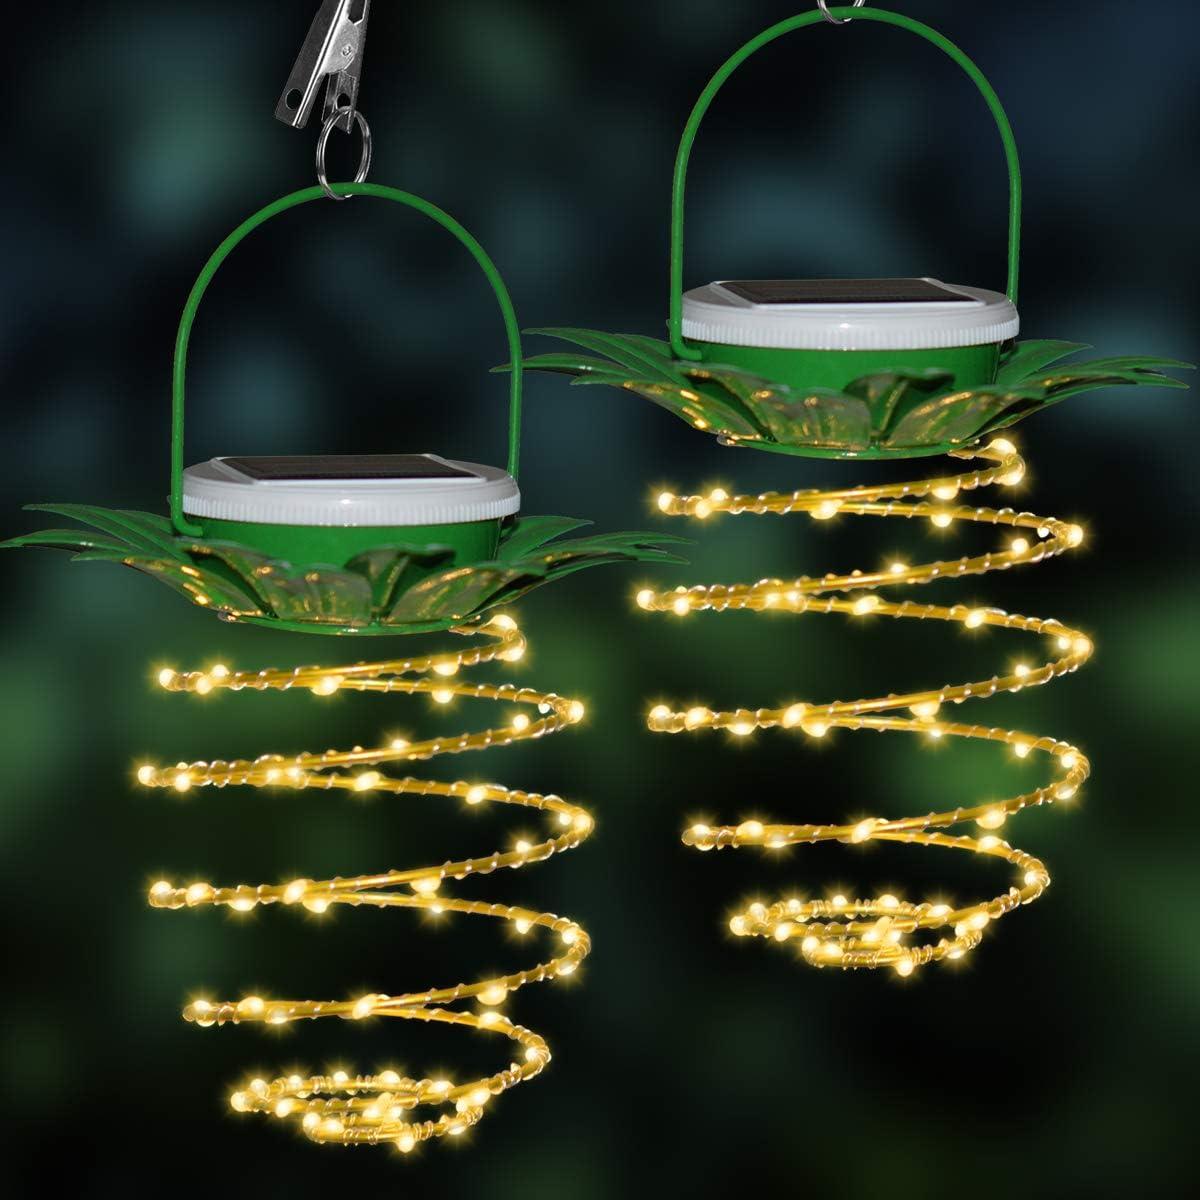 2 Pack Pineapple Solar Hanging Lights 60 LED Waterproof Fairy String Light for Outdoor Garden Patio Decor Lantern Warm White